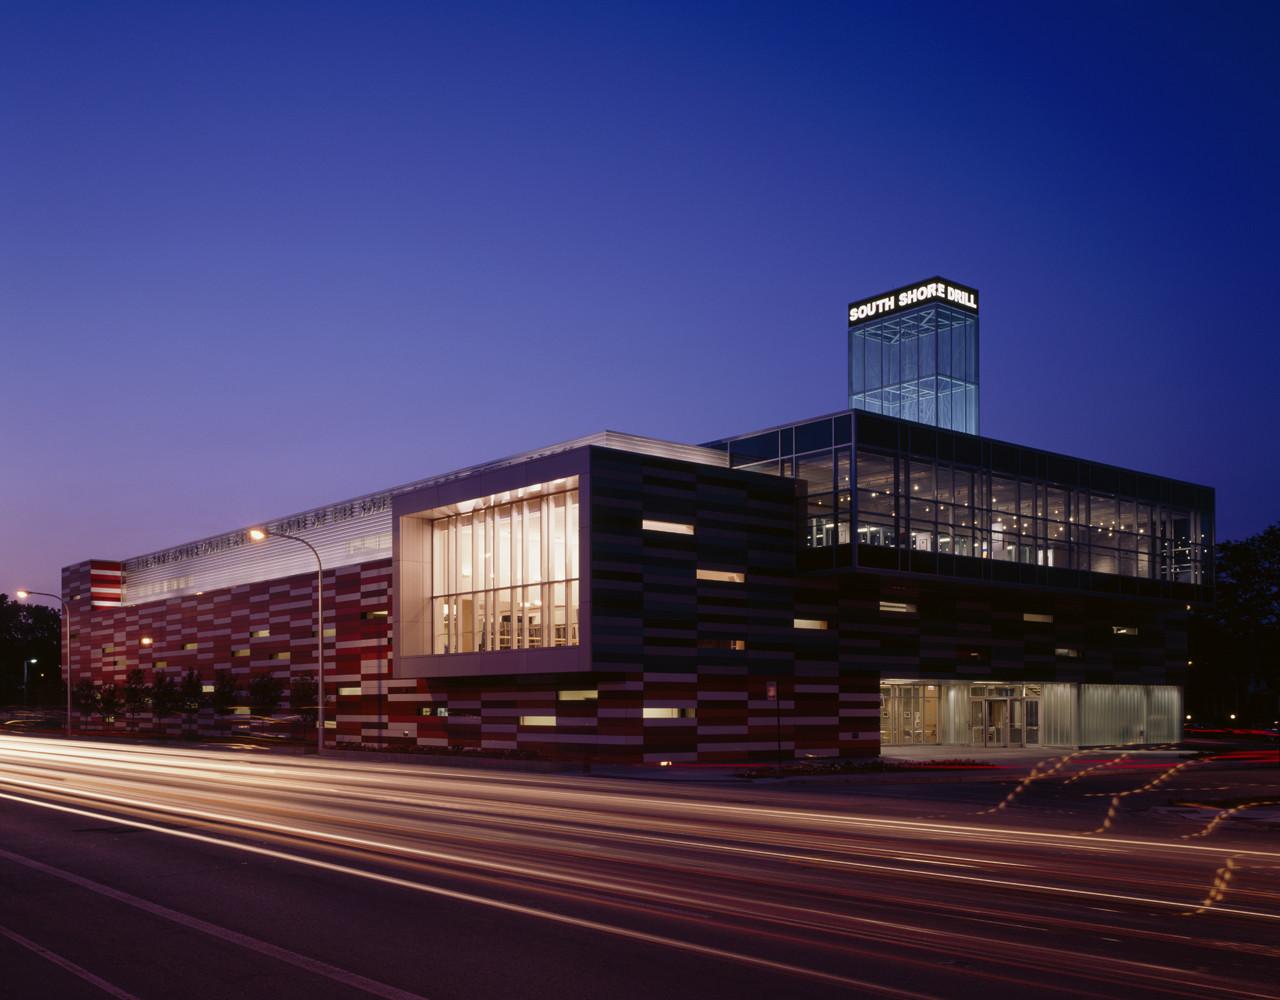 Architect: The Gary Comer Youth Center / John Ronan Architects